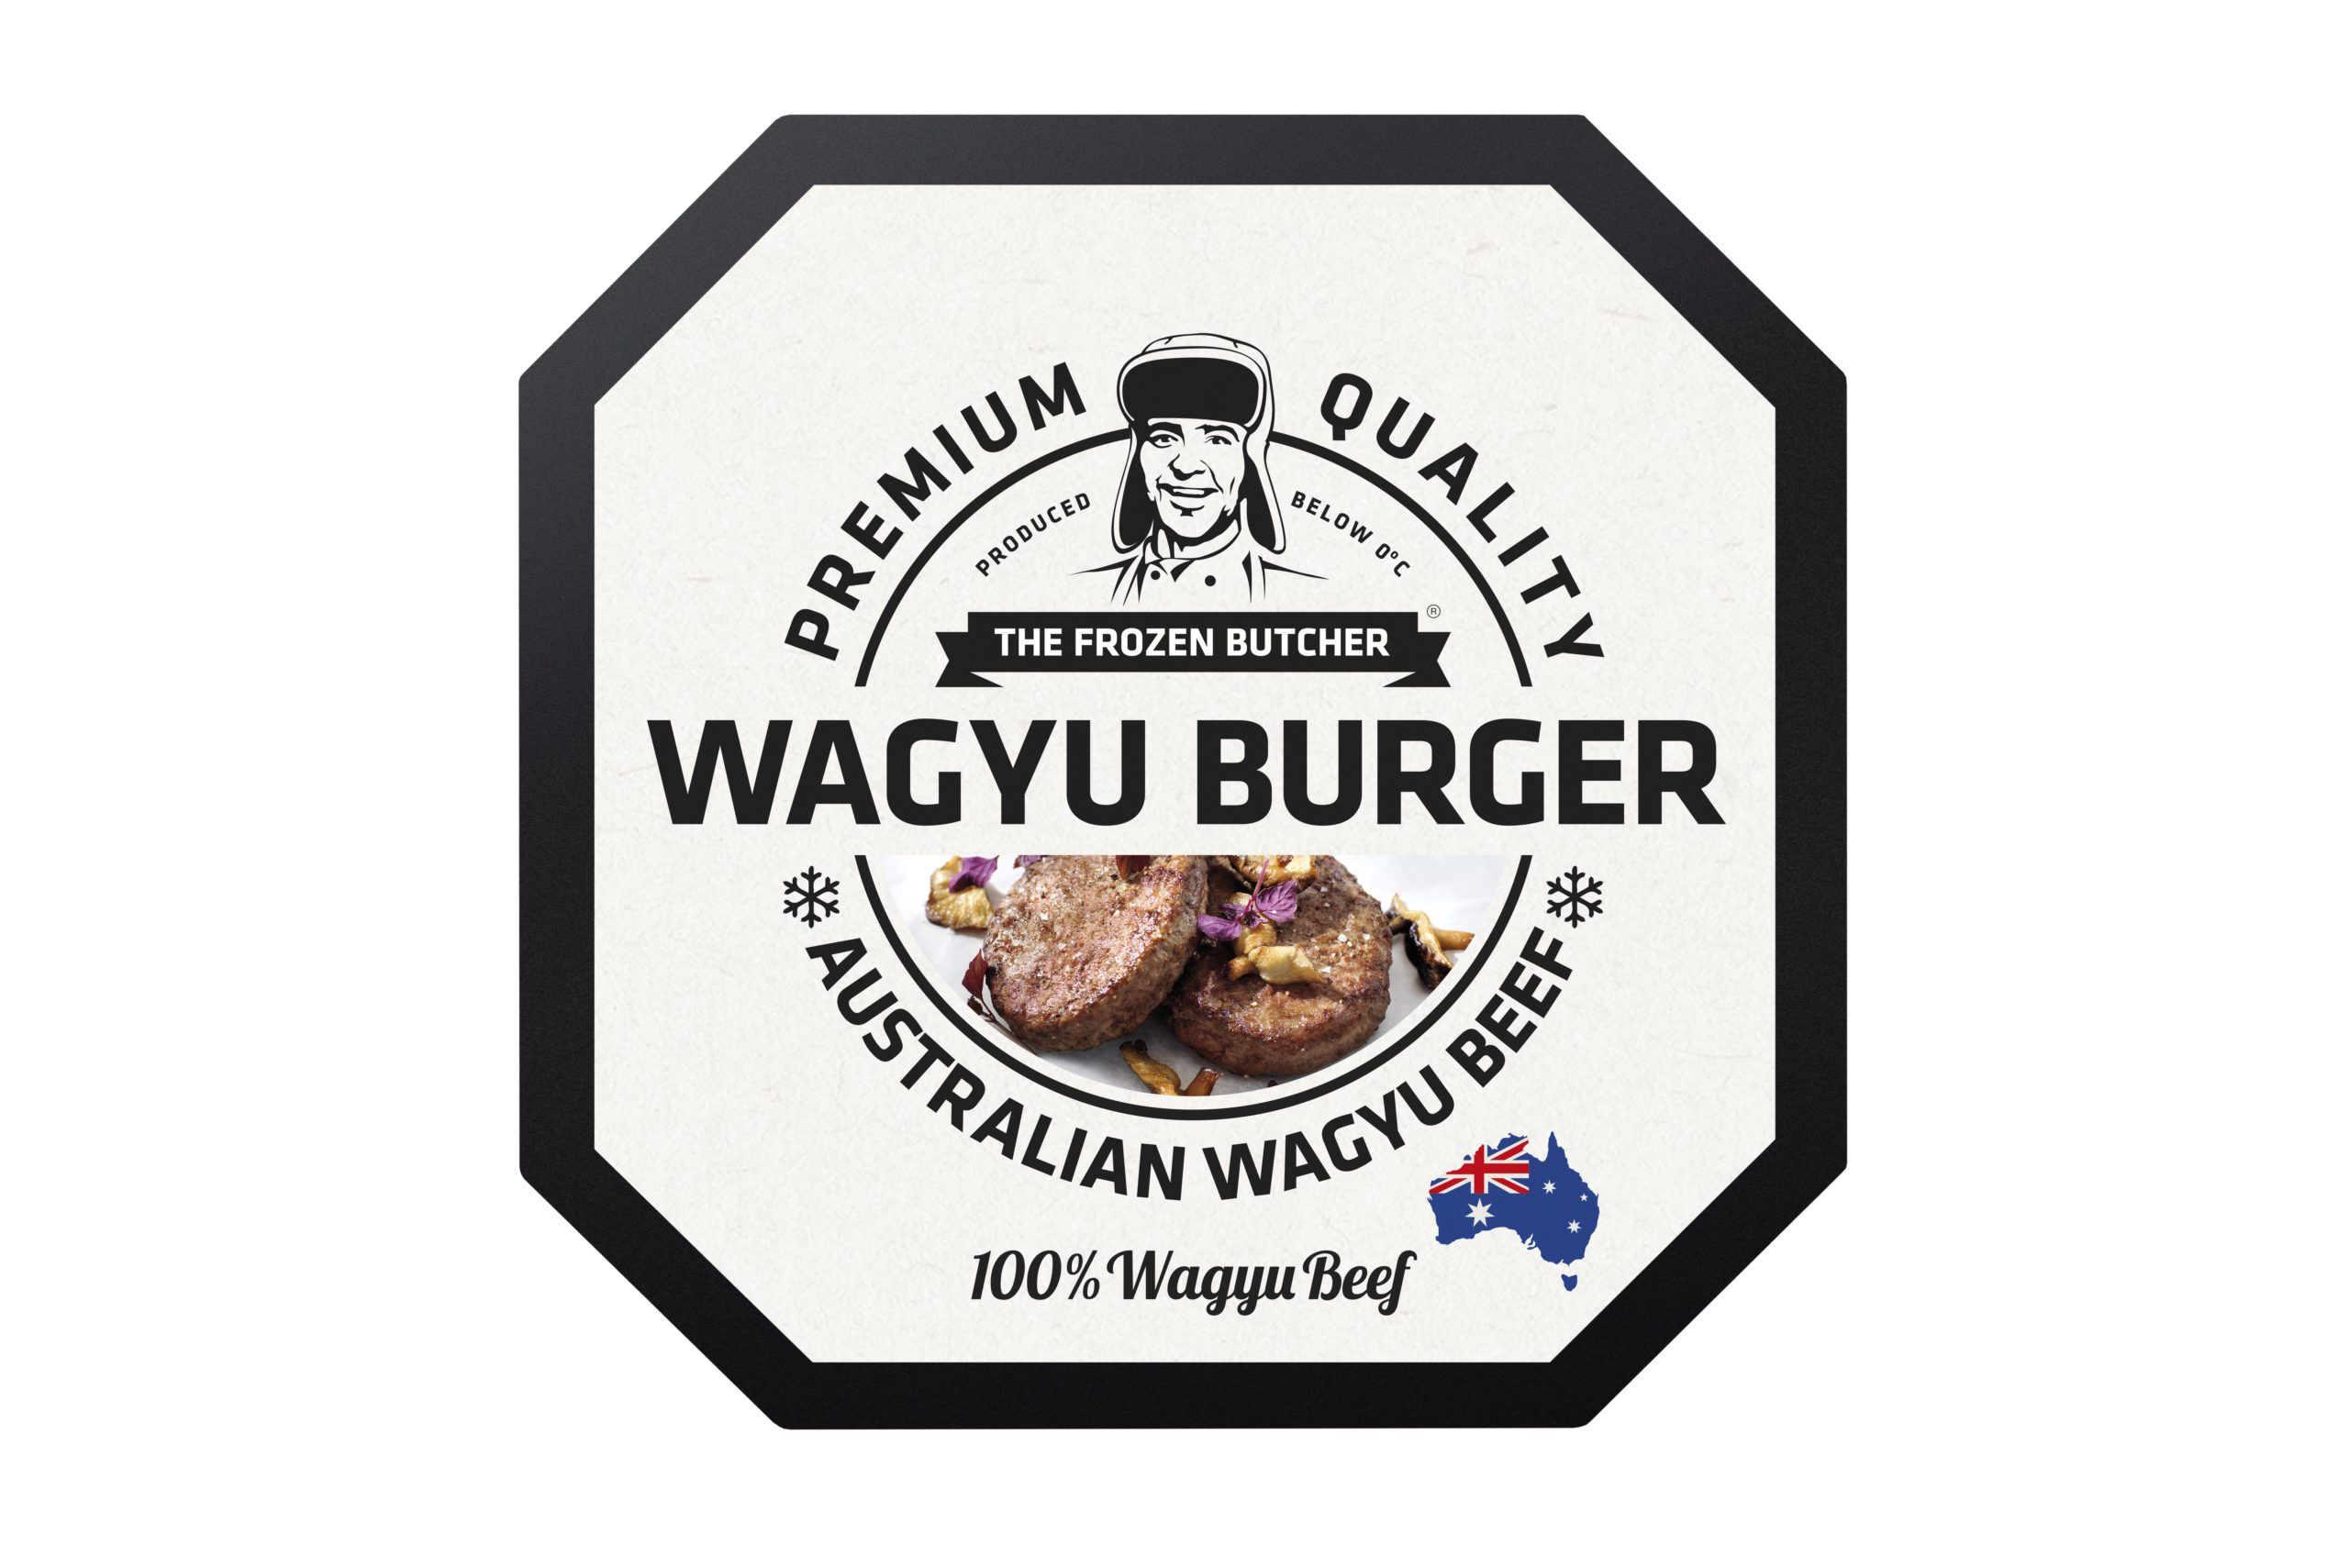 FrozenButcher_Wagyu burger